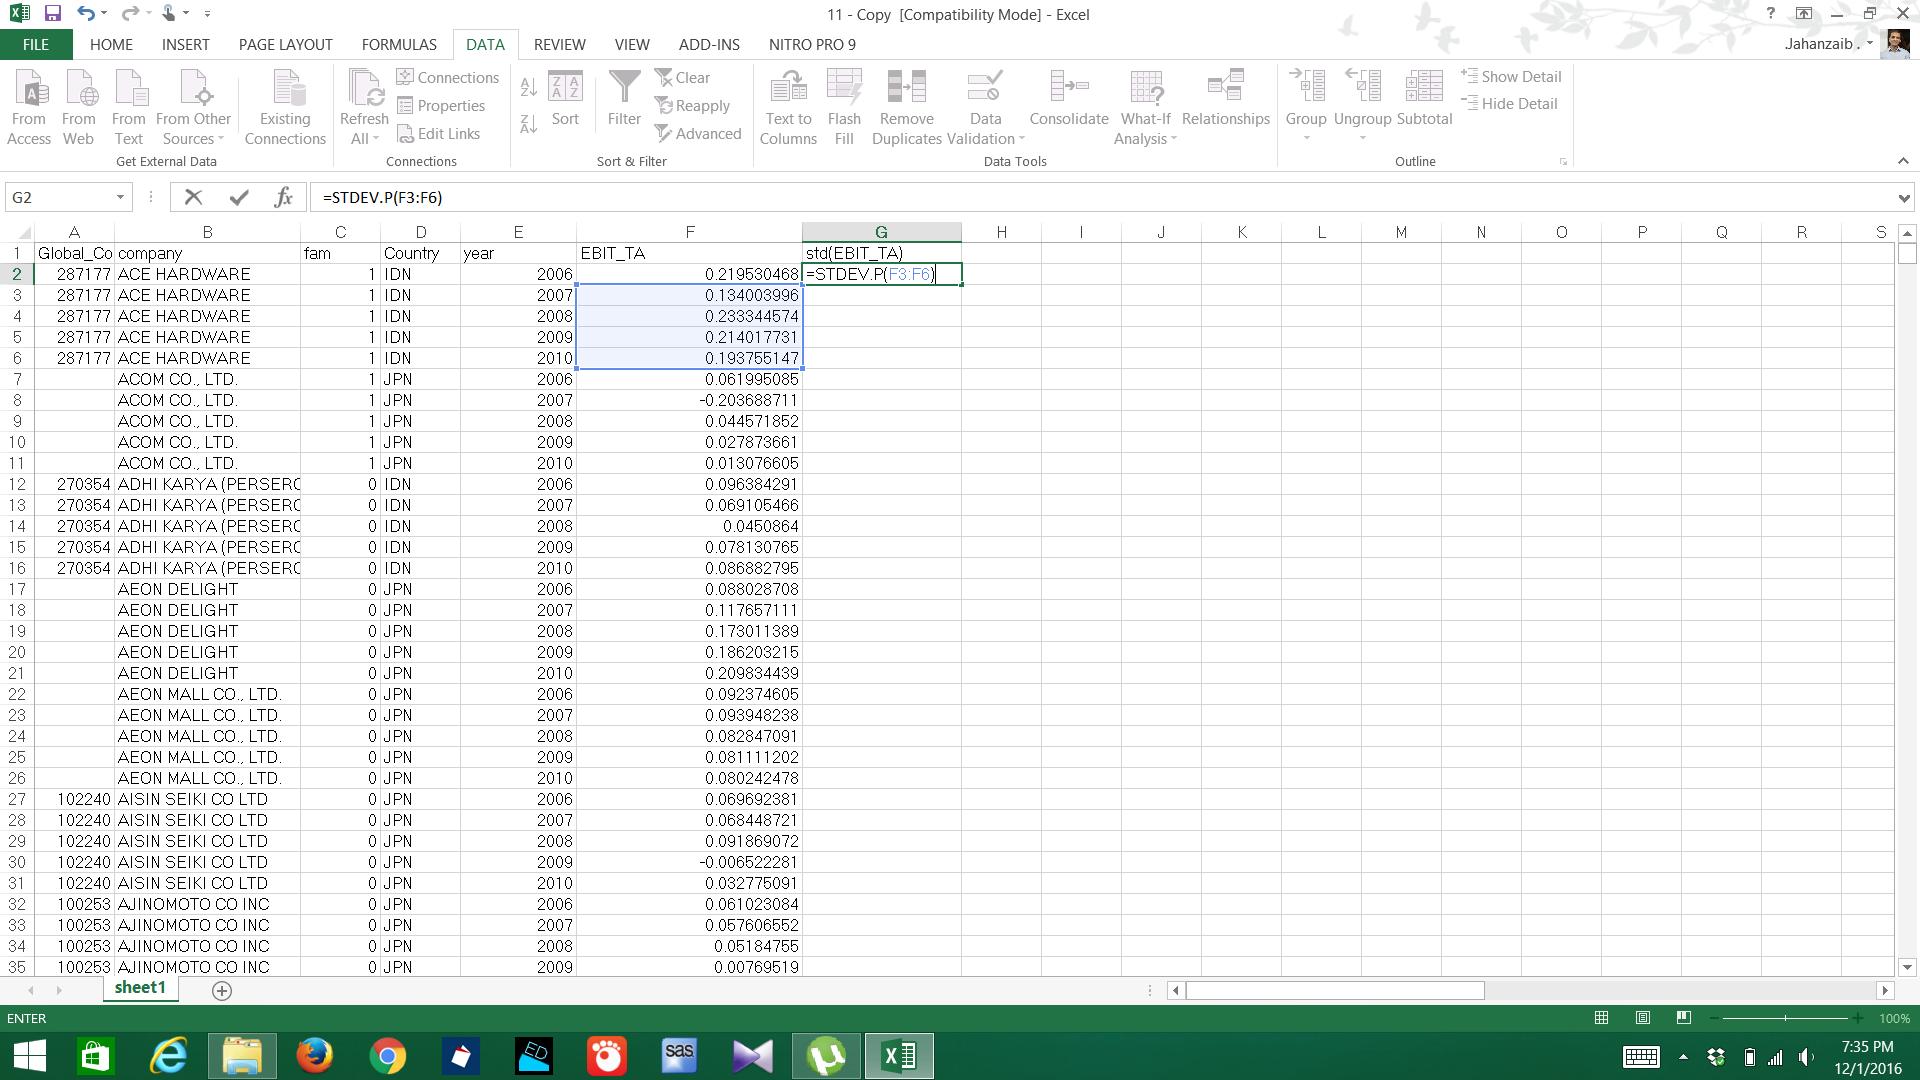 Screenshot 2016-12-01 19.35.15.png